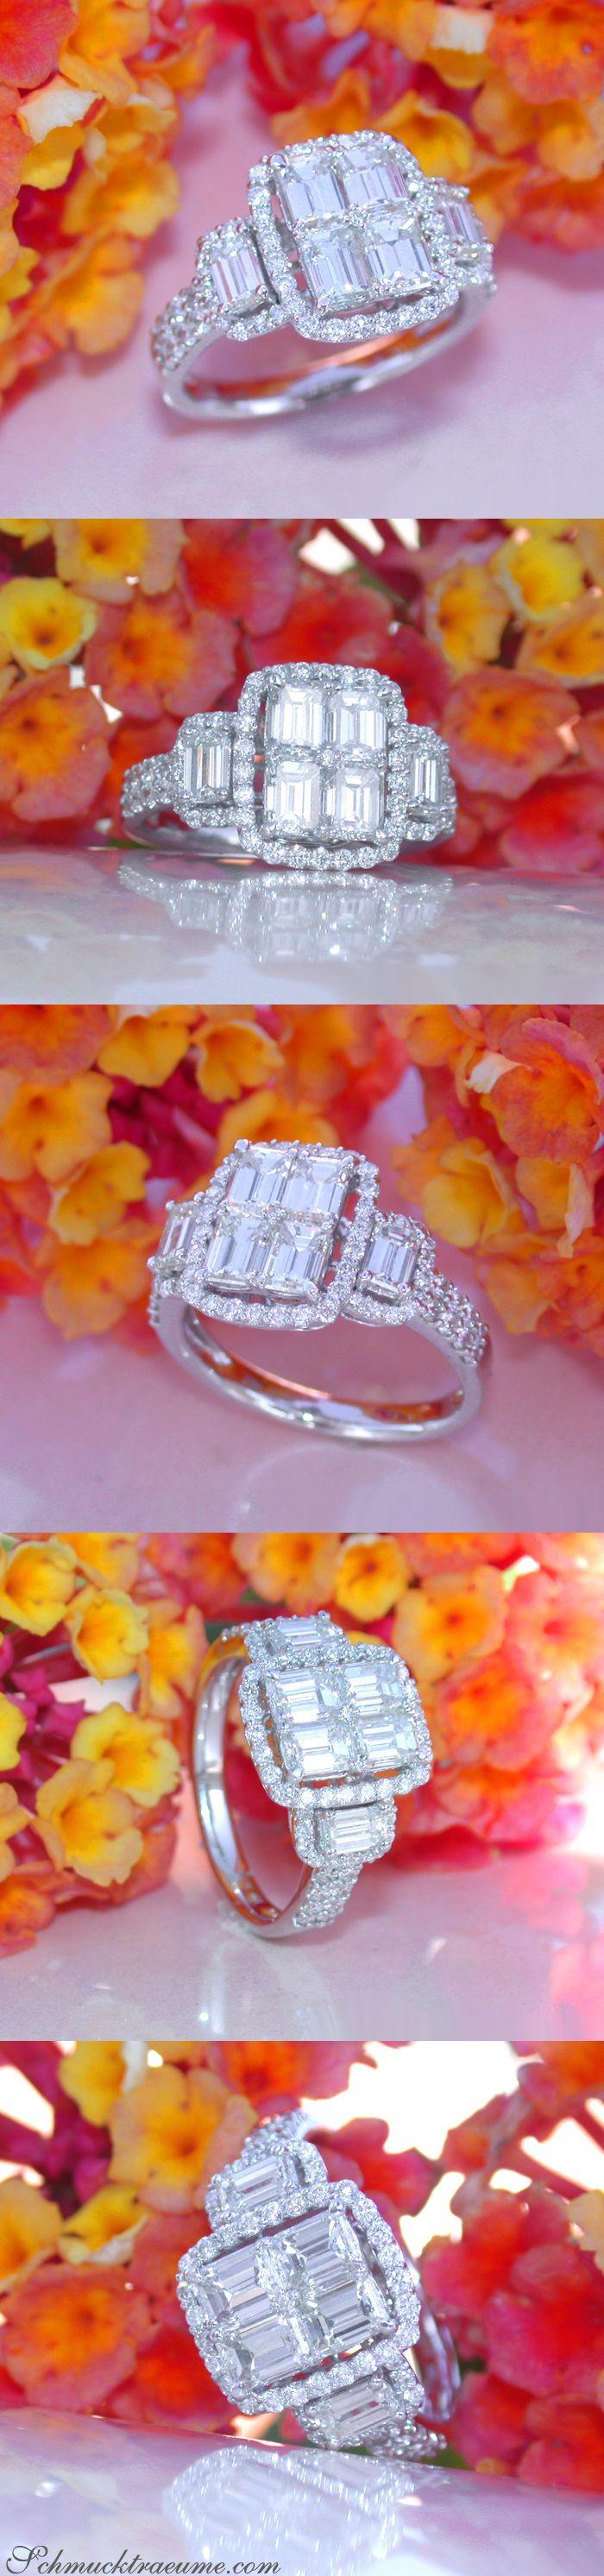 High-end Emerald Cut Diamond Ring | Luxuriöser Brillant Ring mit Diamanten im Smaragdschliff | 2,29 ct. G VS/VVS | WG 18k | Visit: schmucktraeume.com | Like:https://www.facebook.com/Noble-Juwelen-150871984924926/